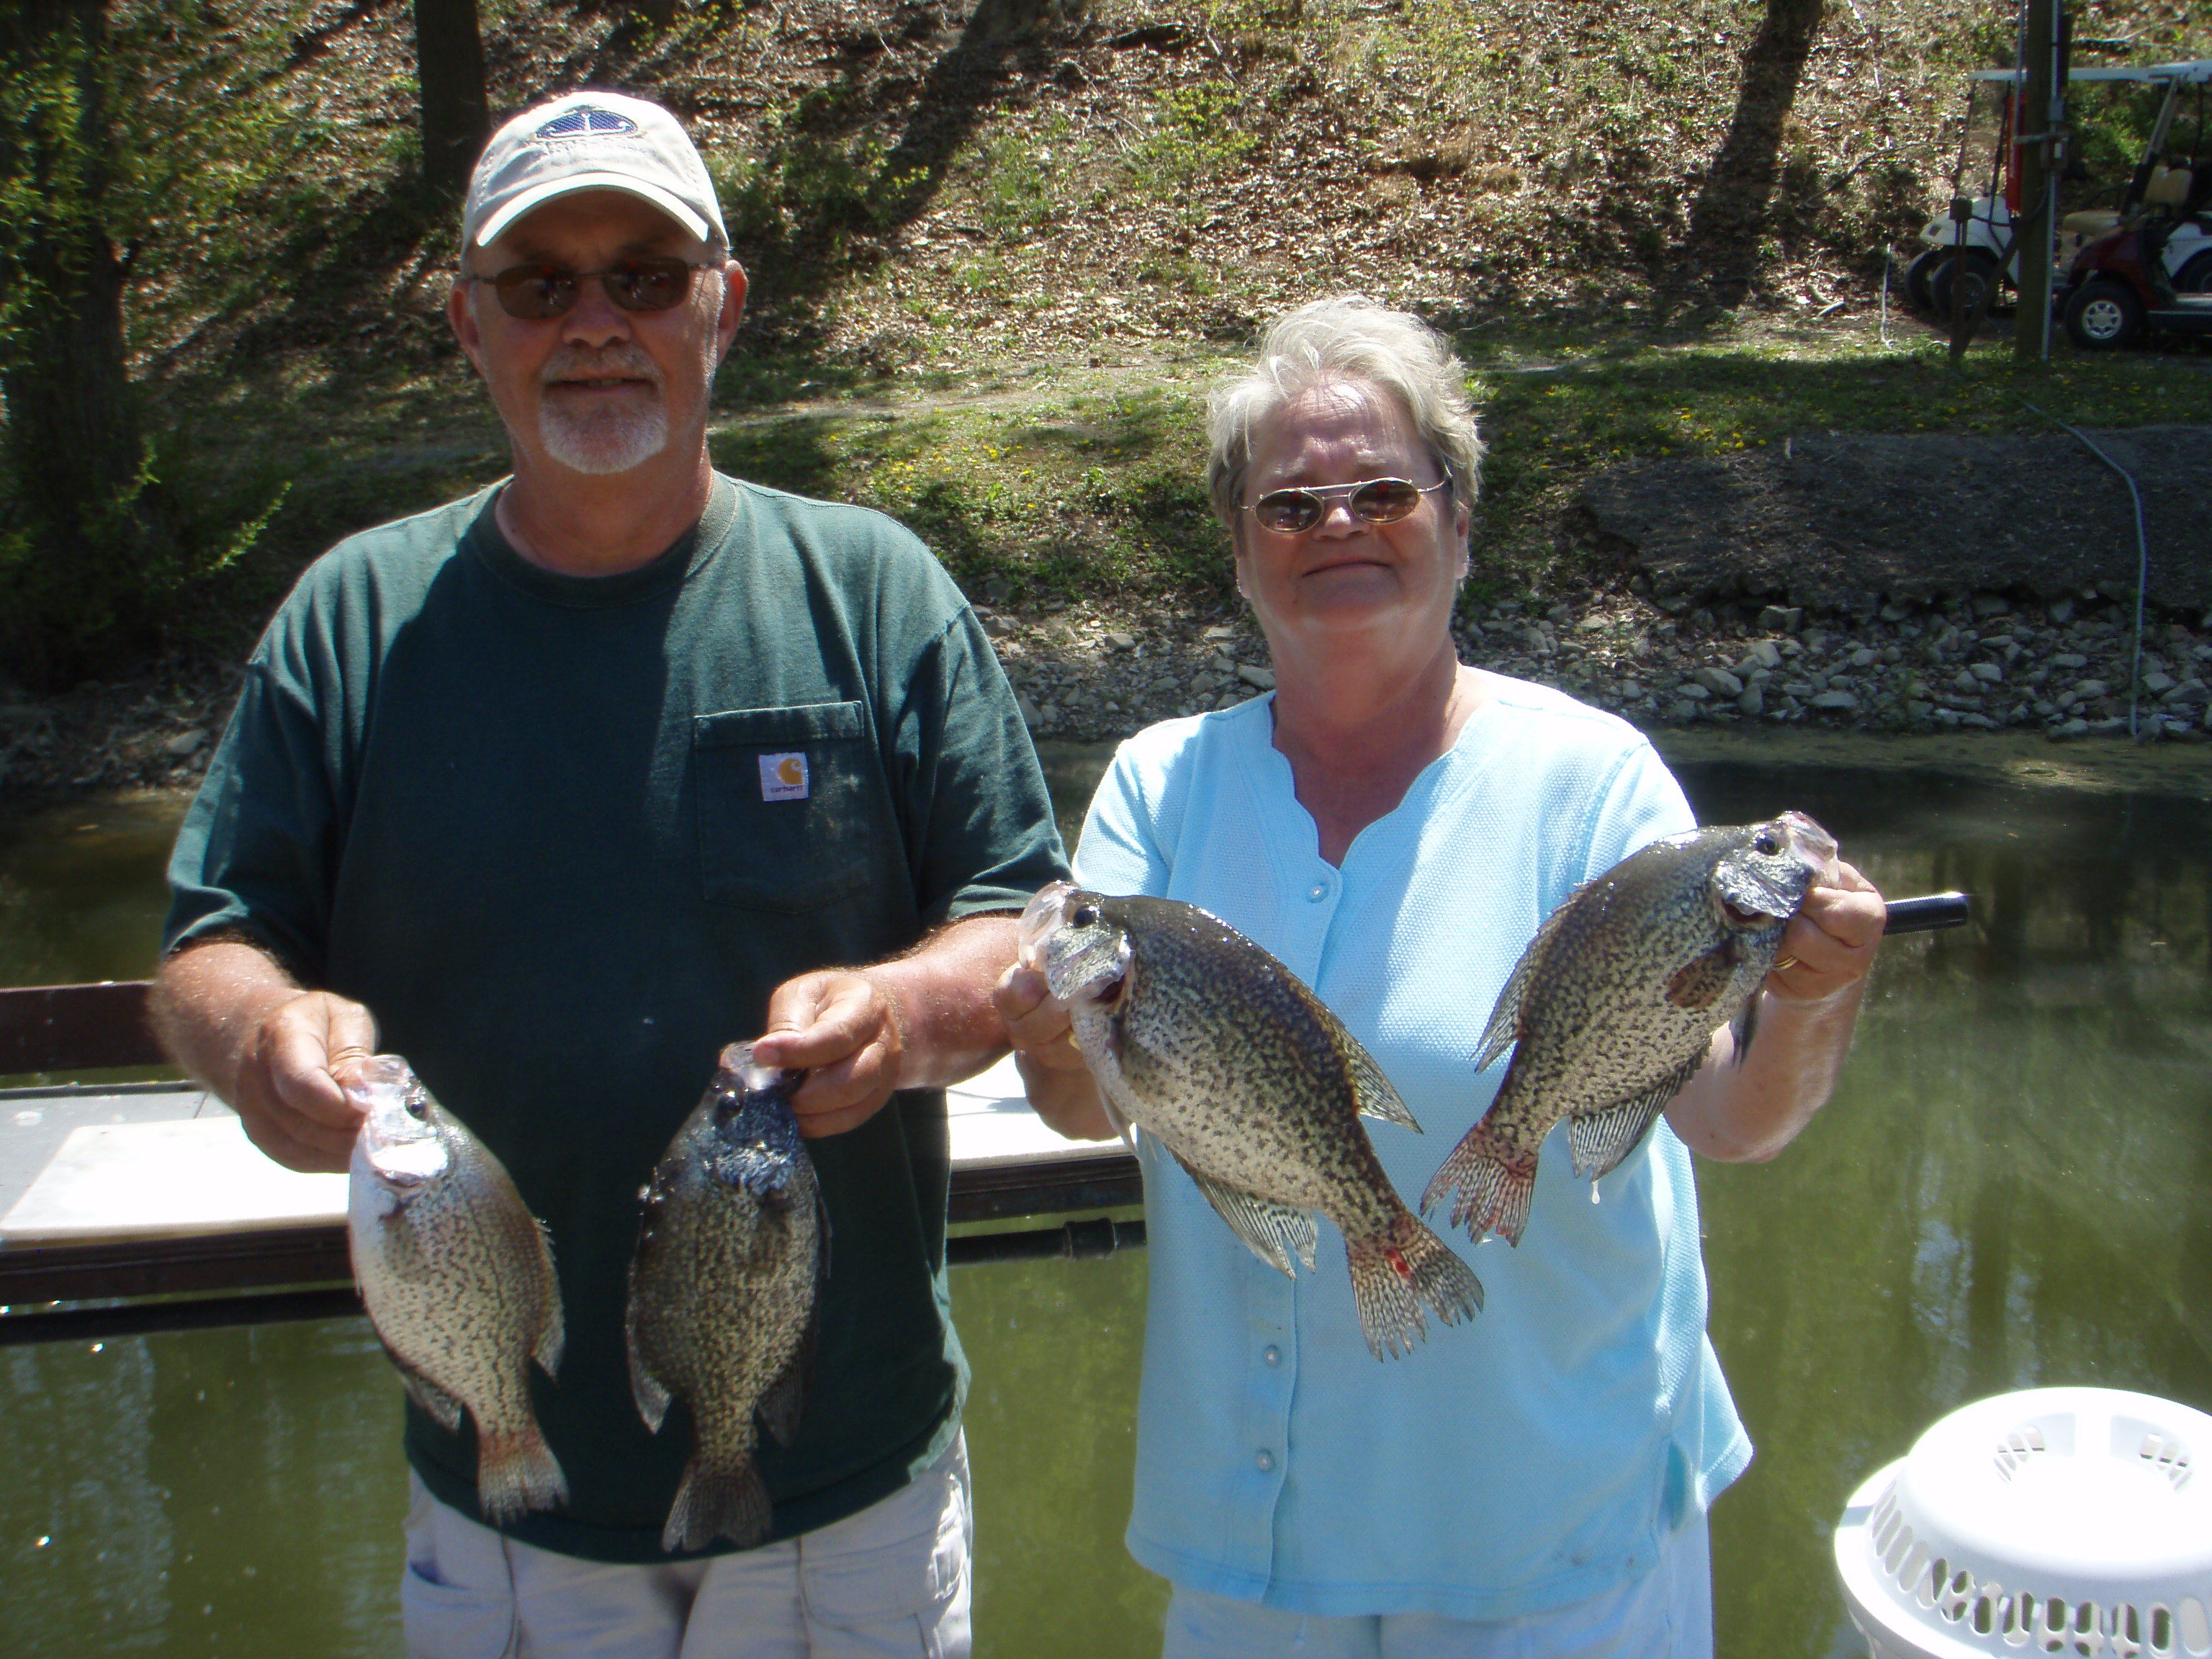 Holiday hills resort on lake barkley for Ky and barkley lake fishing report